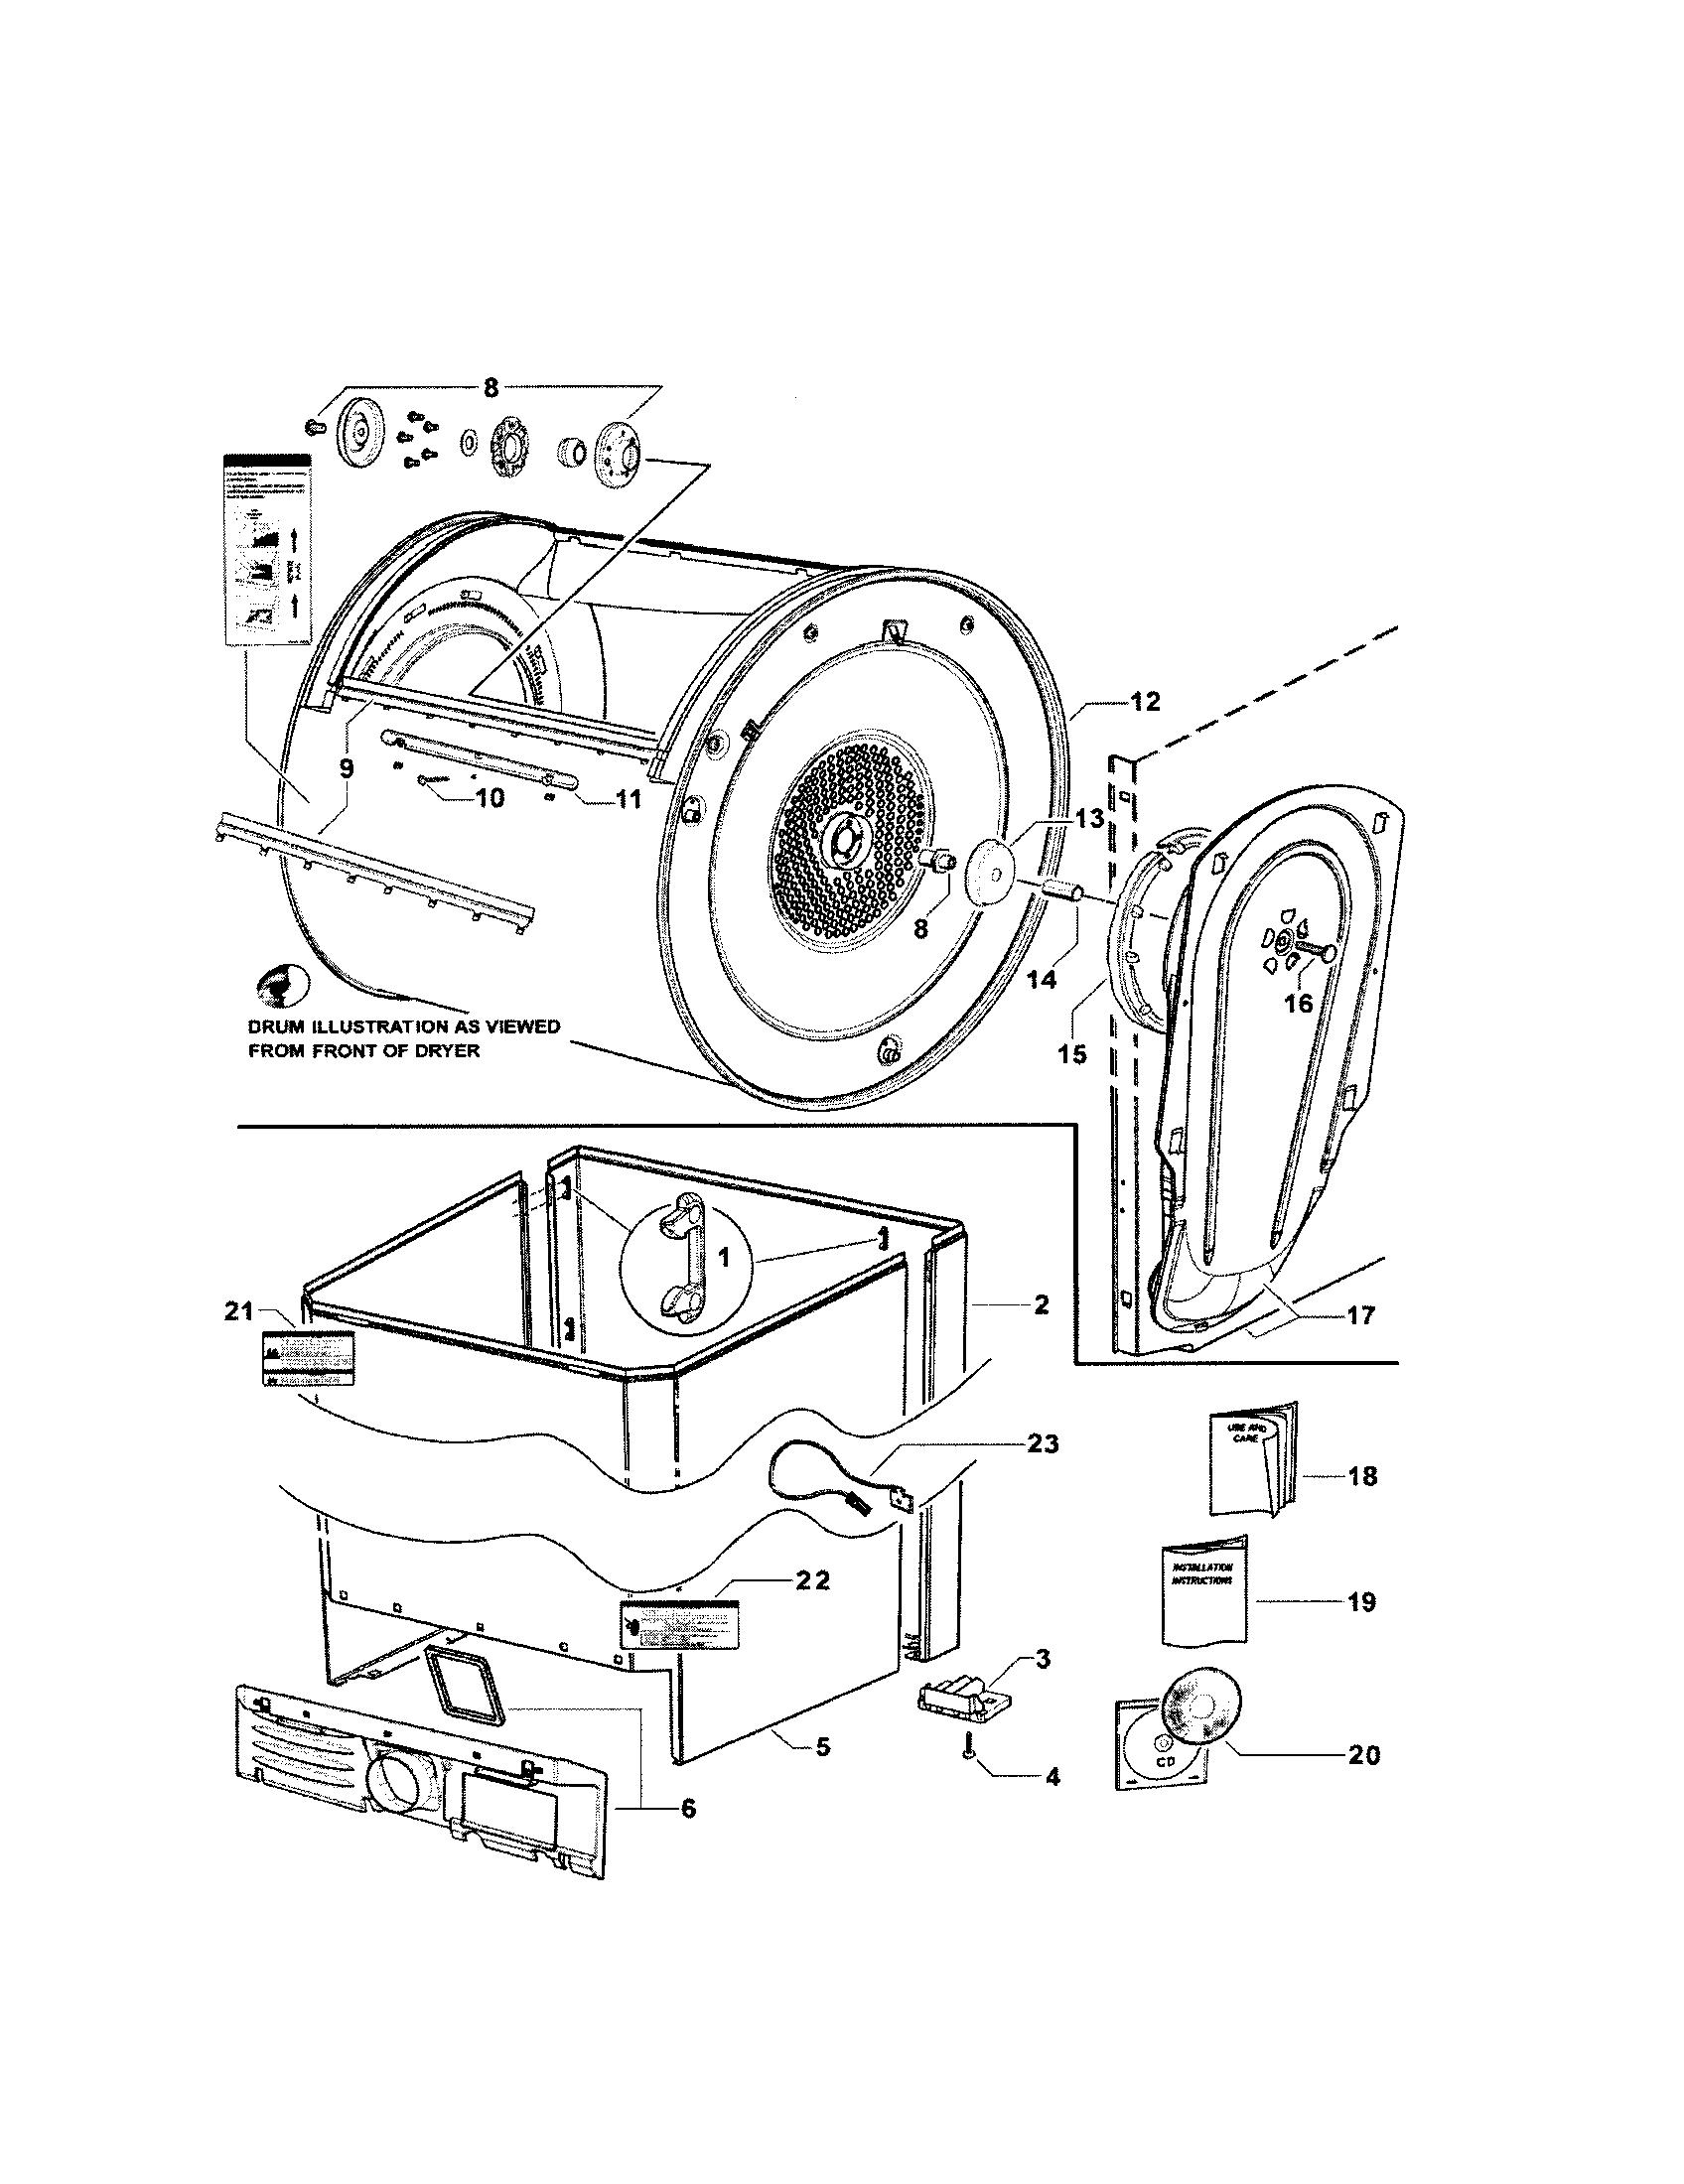 Fisher-Paykel model DEGX2-96102A residential dryer genuine